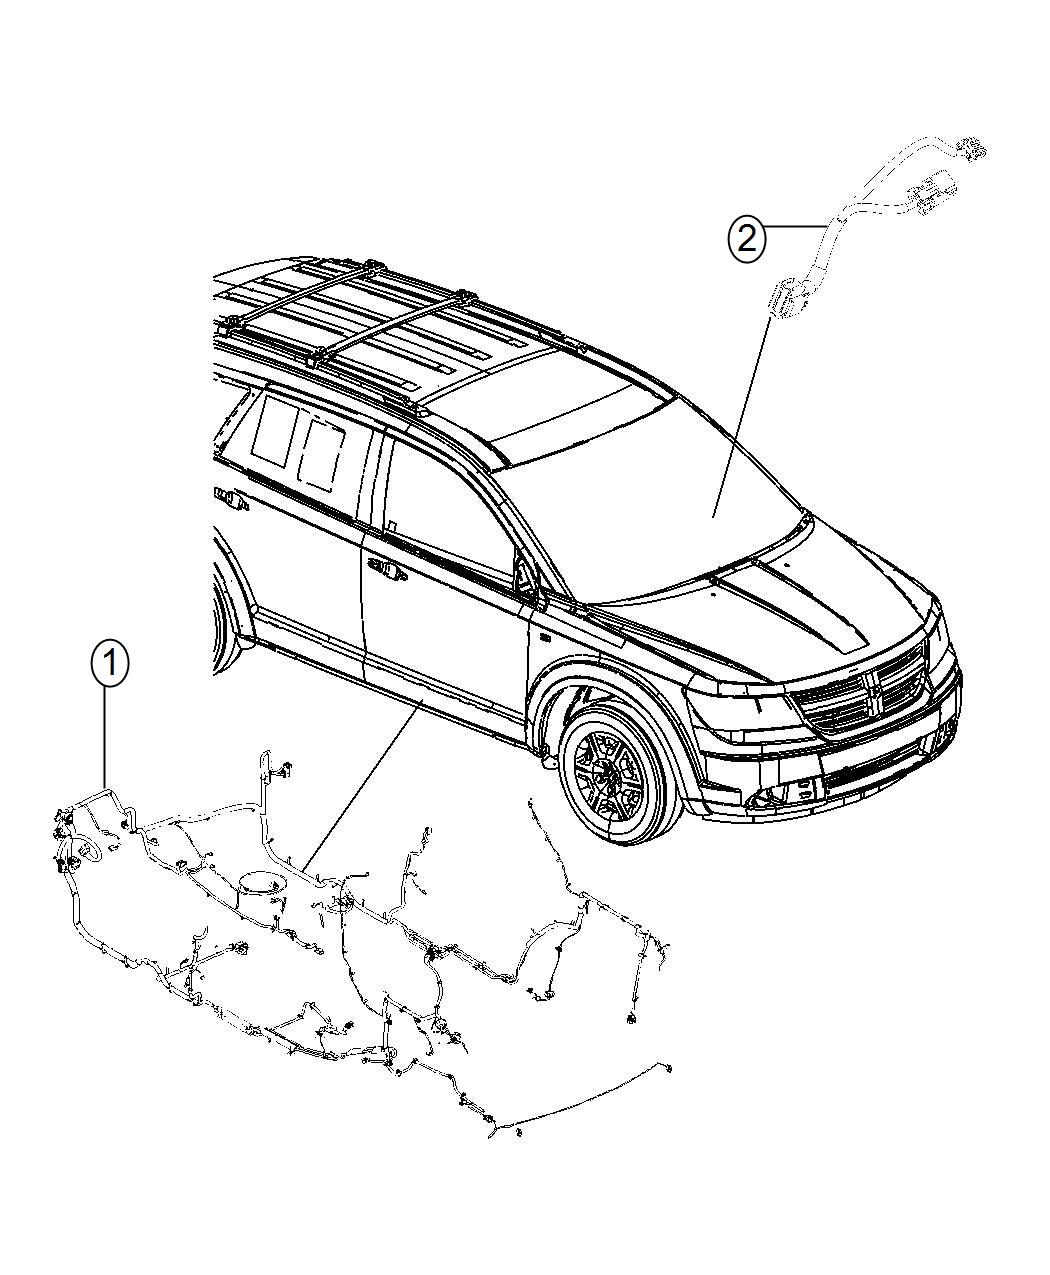 Dodge Journey Wiring. Unified body. Export. [6 premium